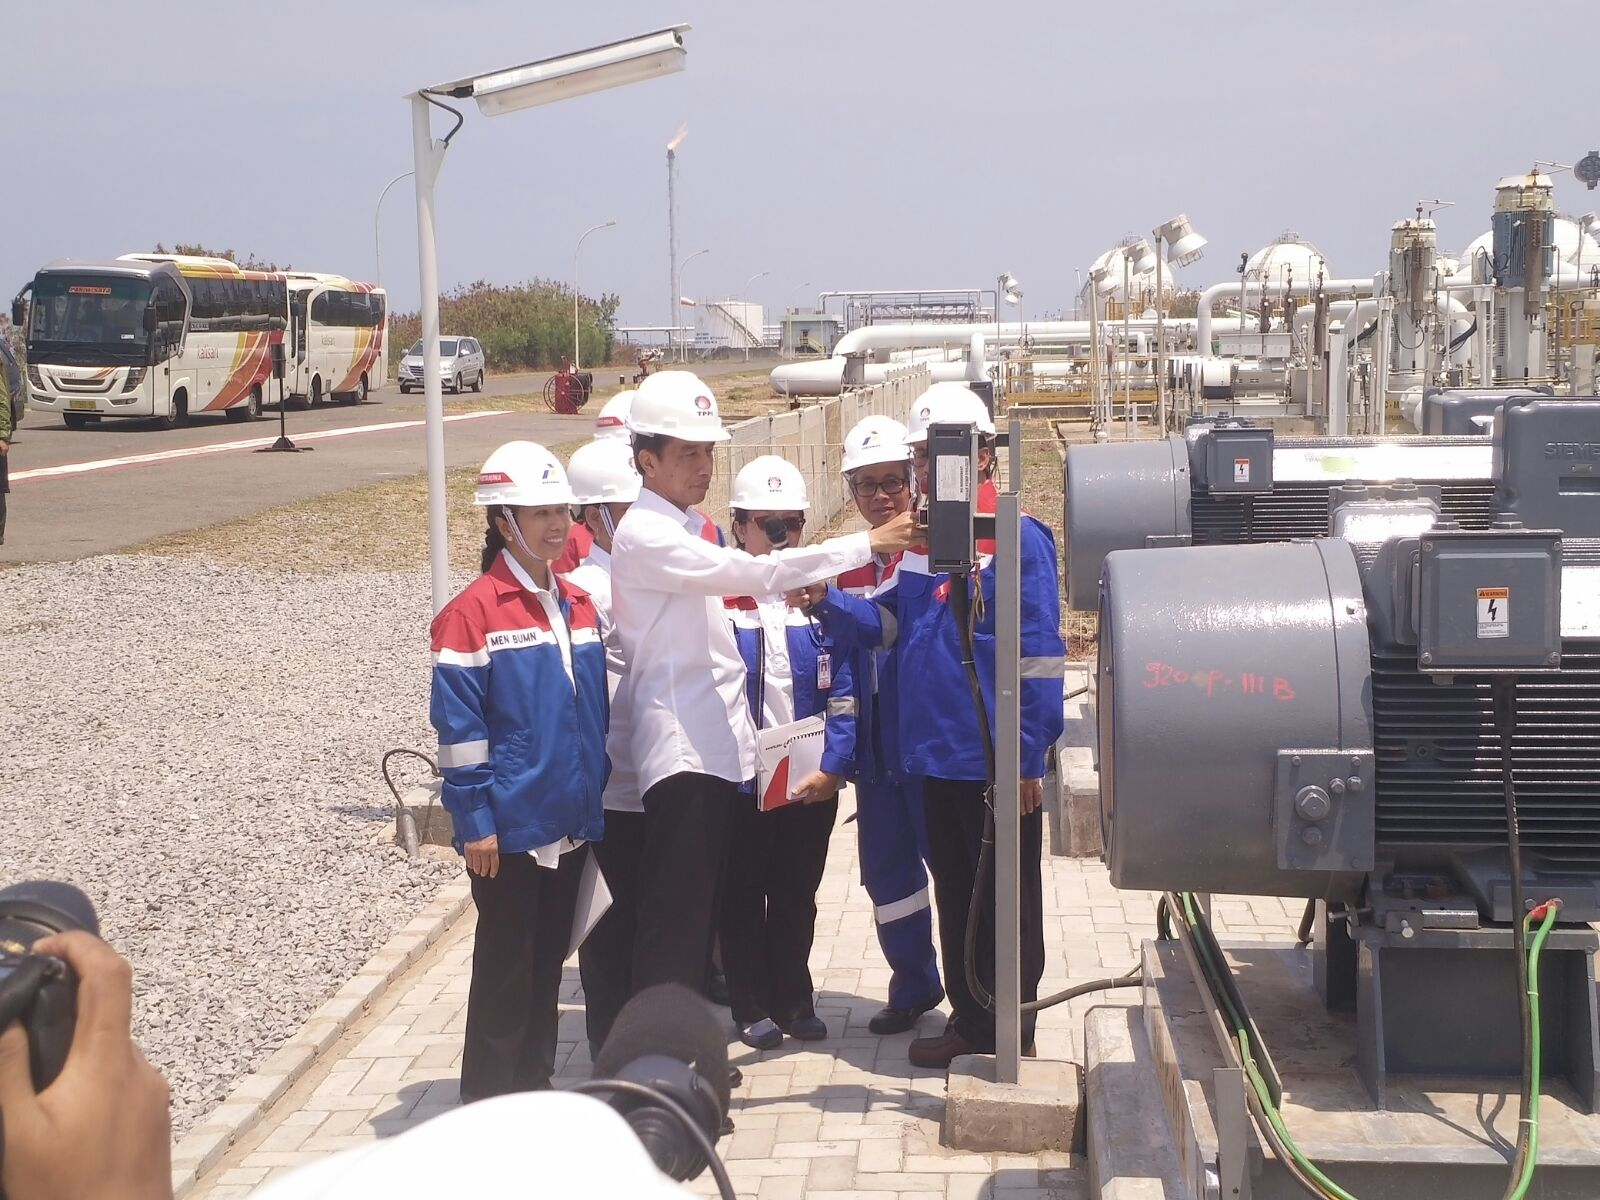 Presiden Joko Widodo meninjau kilang TPPI di Tuban. Rencananya di lokasi itu akan dibangun industri petrokimia.